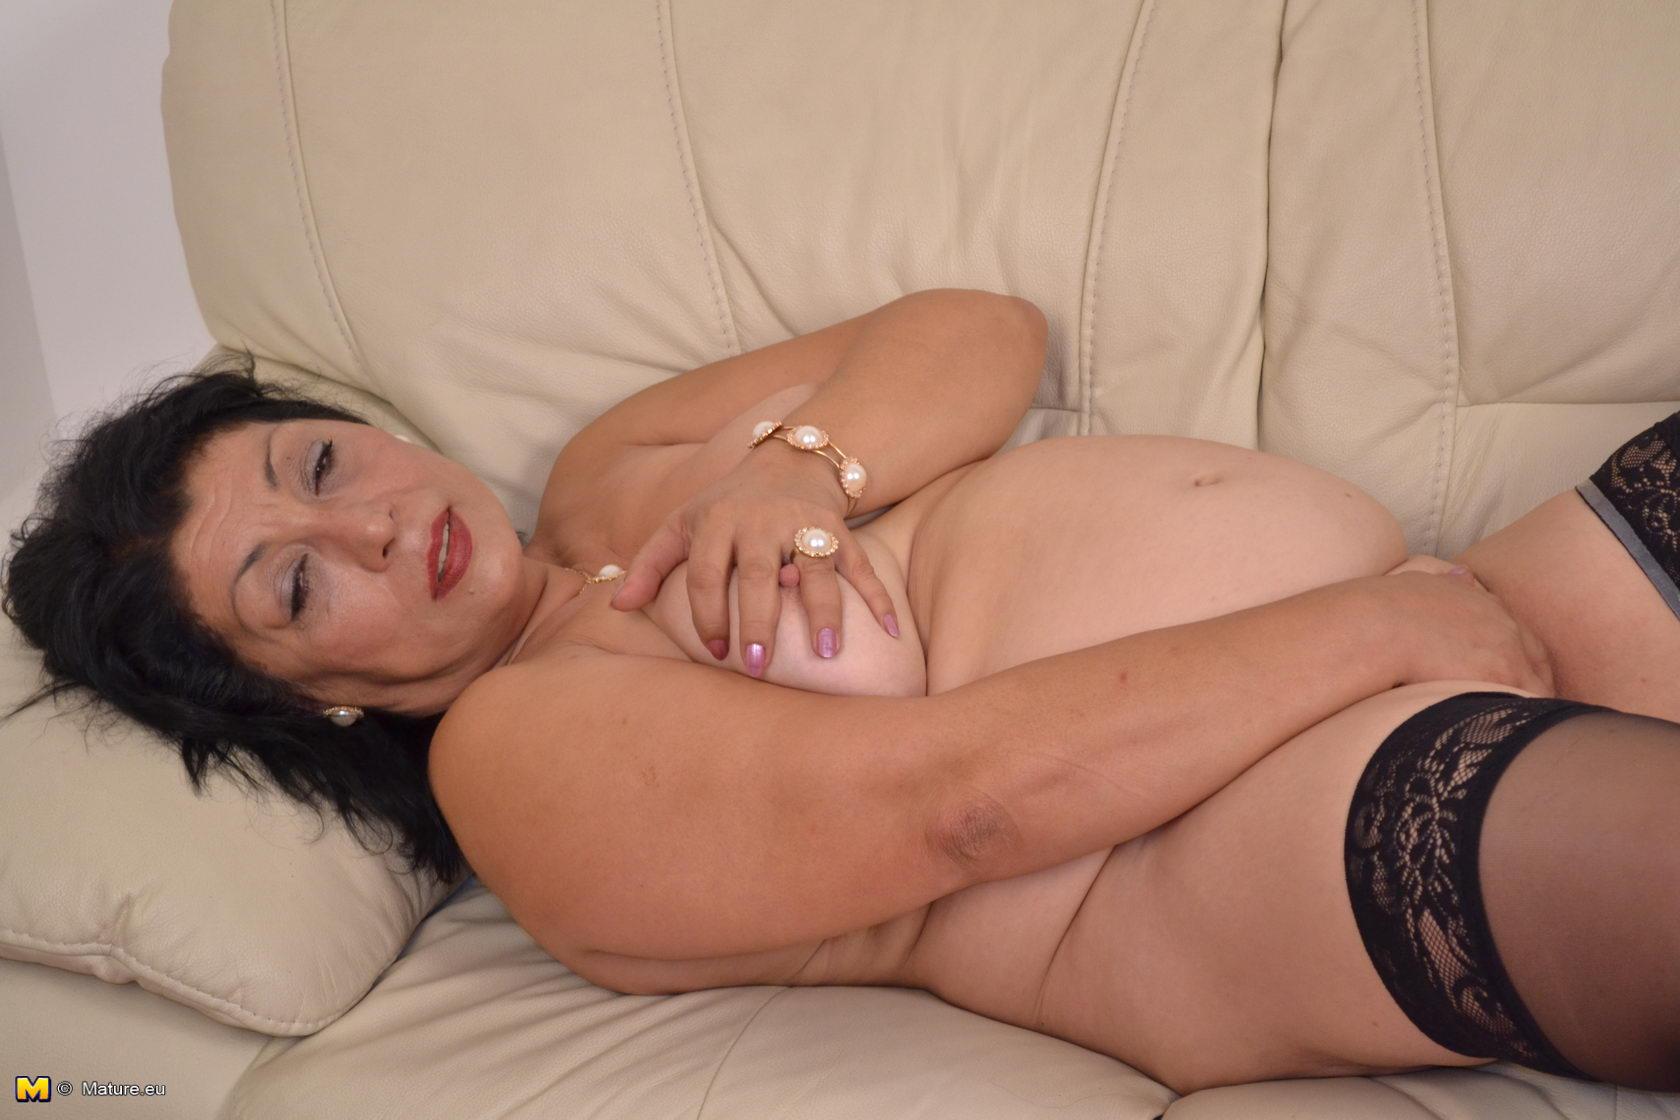 Naked tits in sheer lingerie